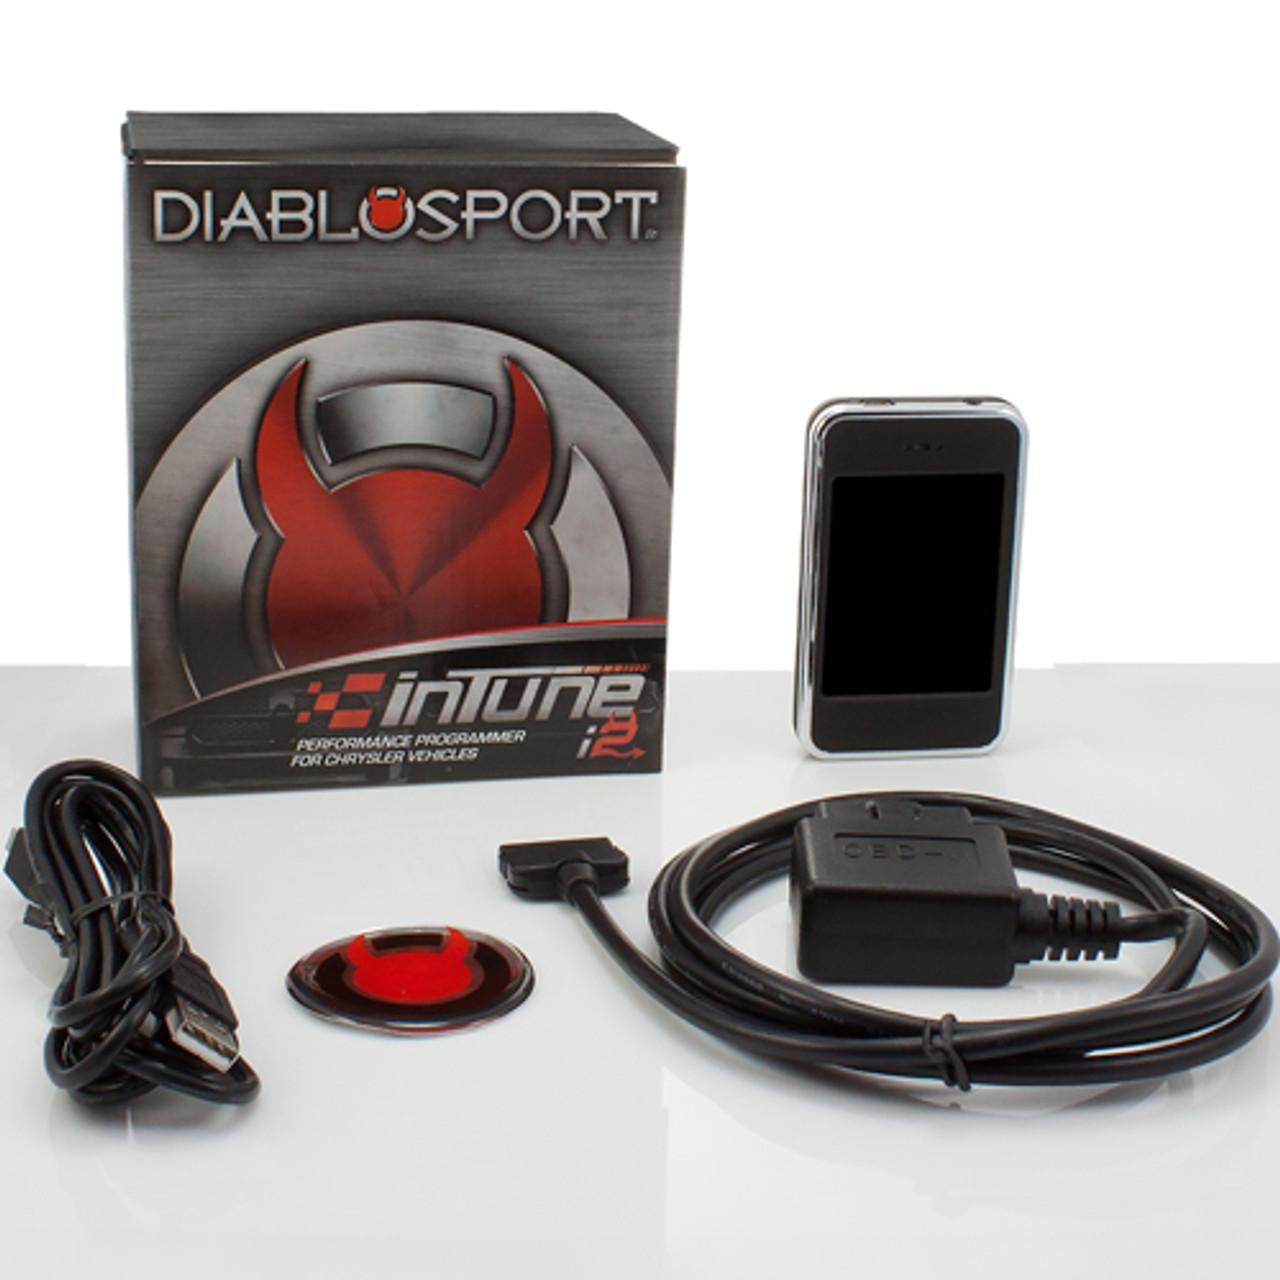 More power for your Mopar from Diablosport